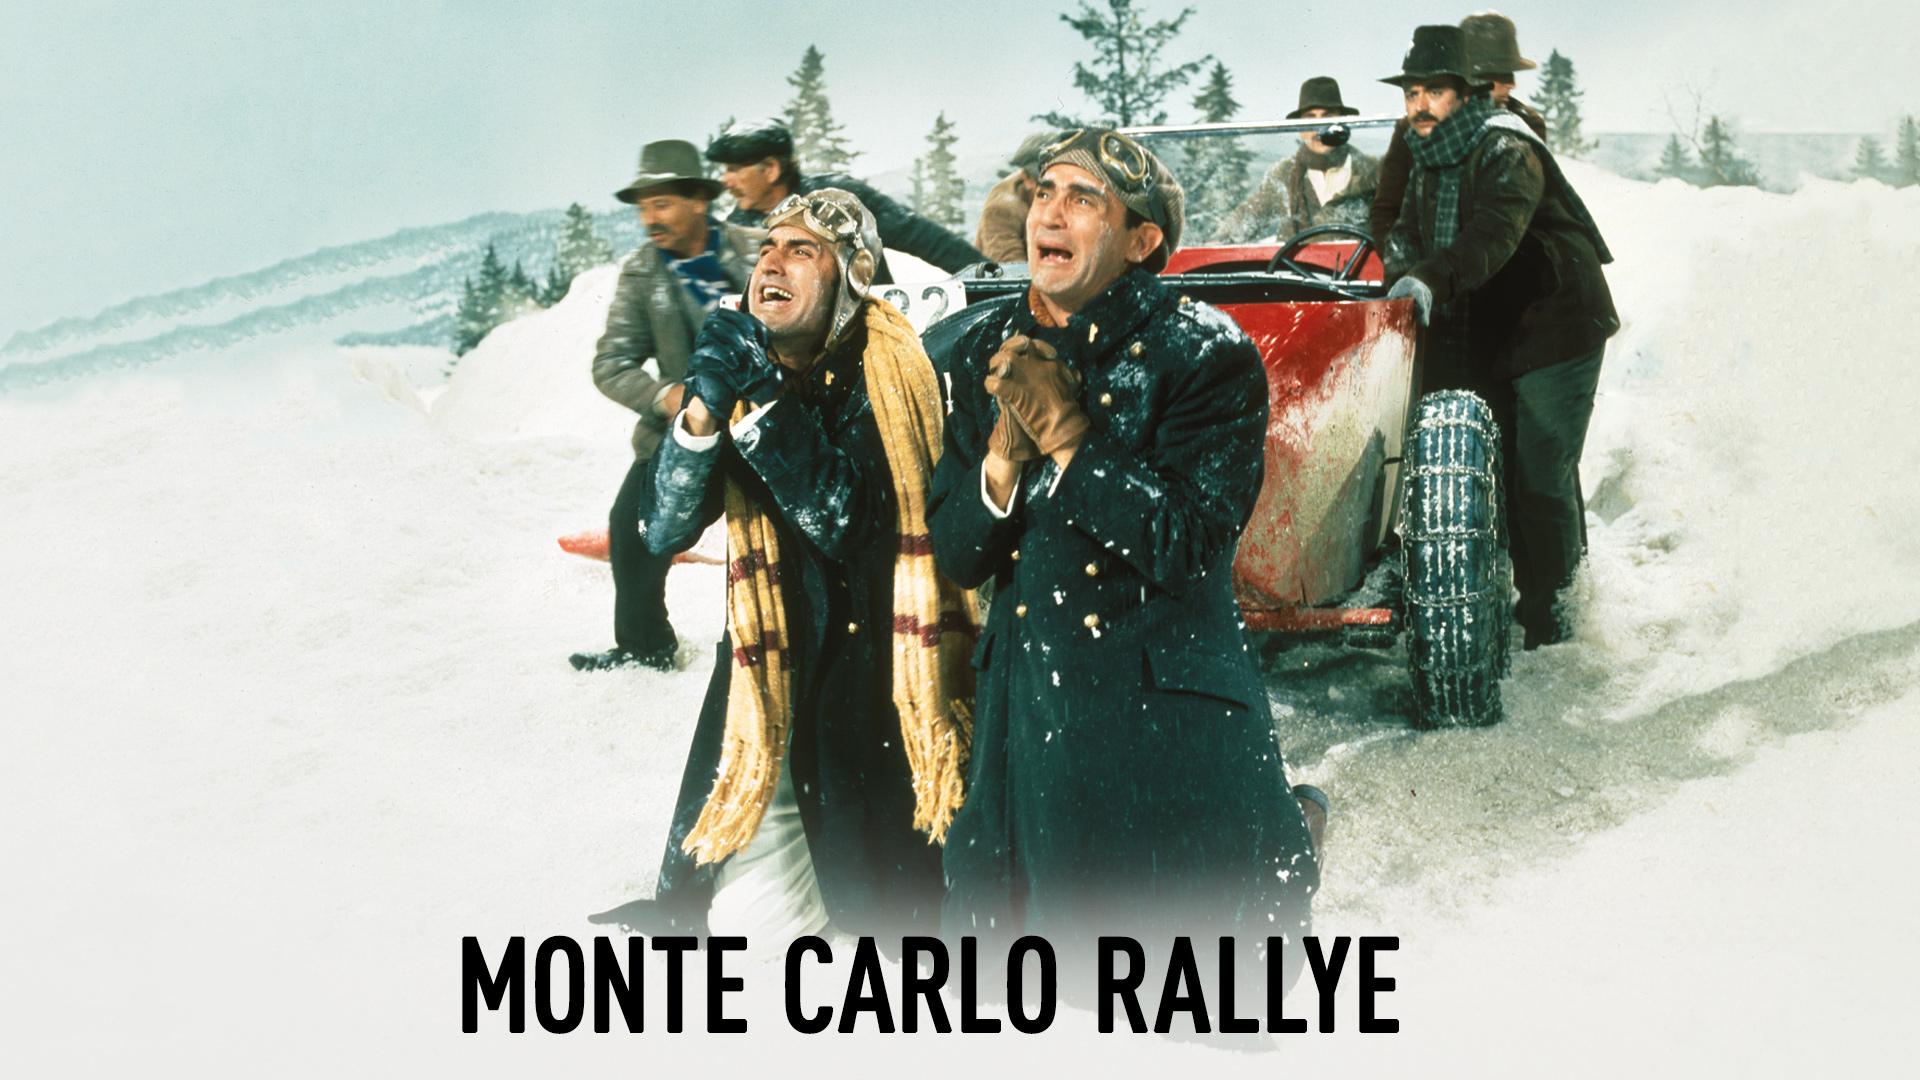 Monte Carlo Rallye